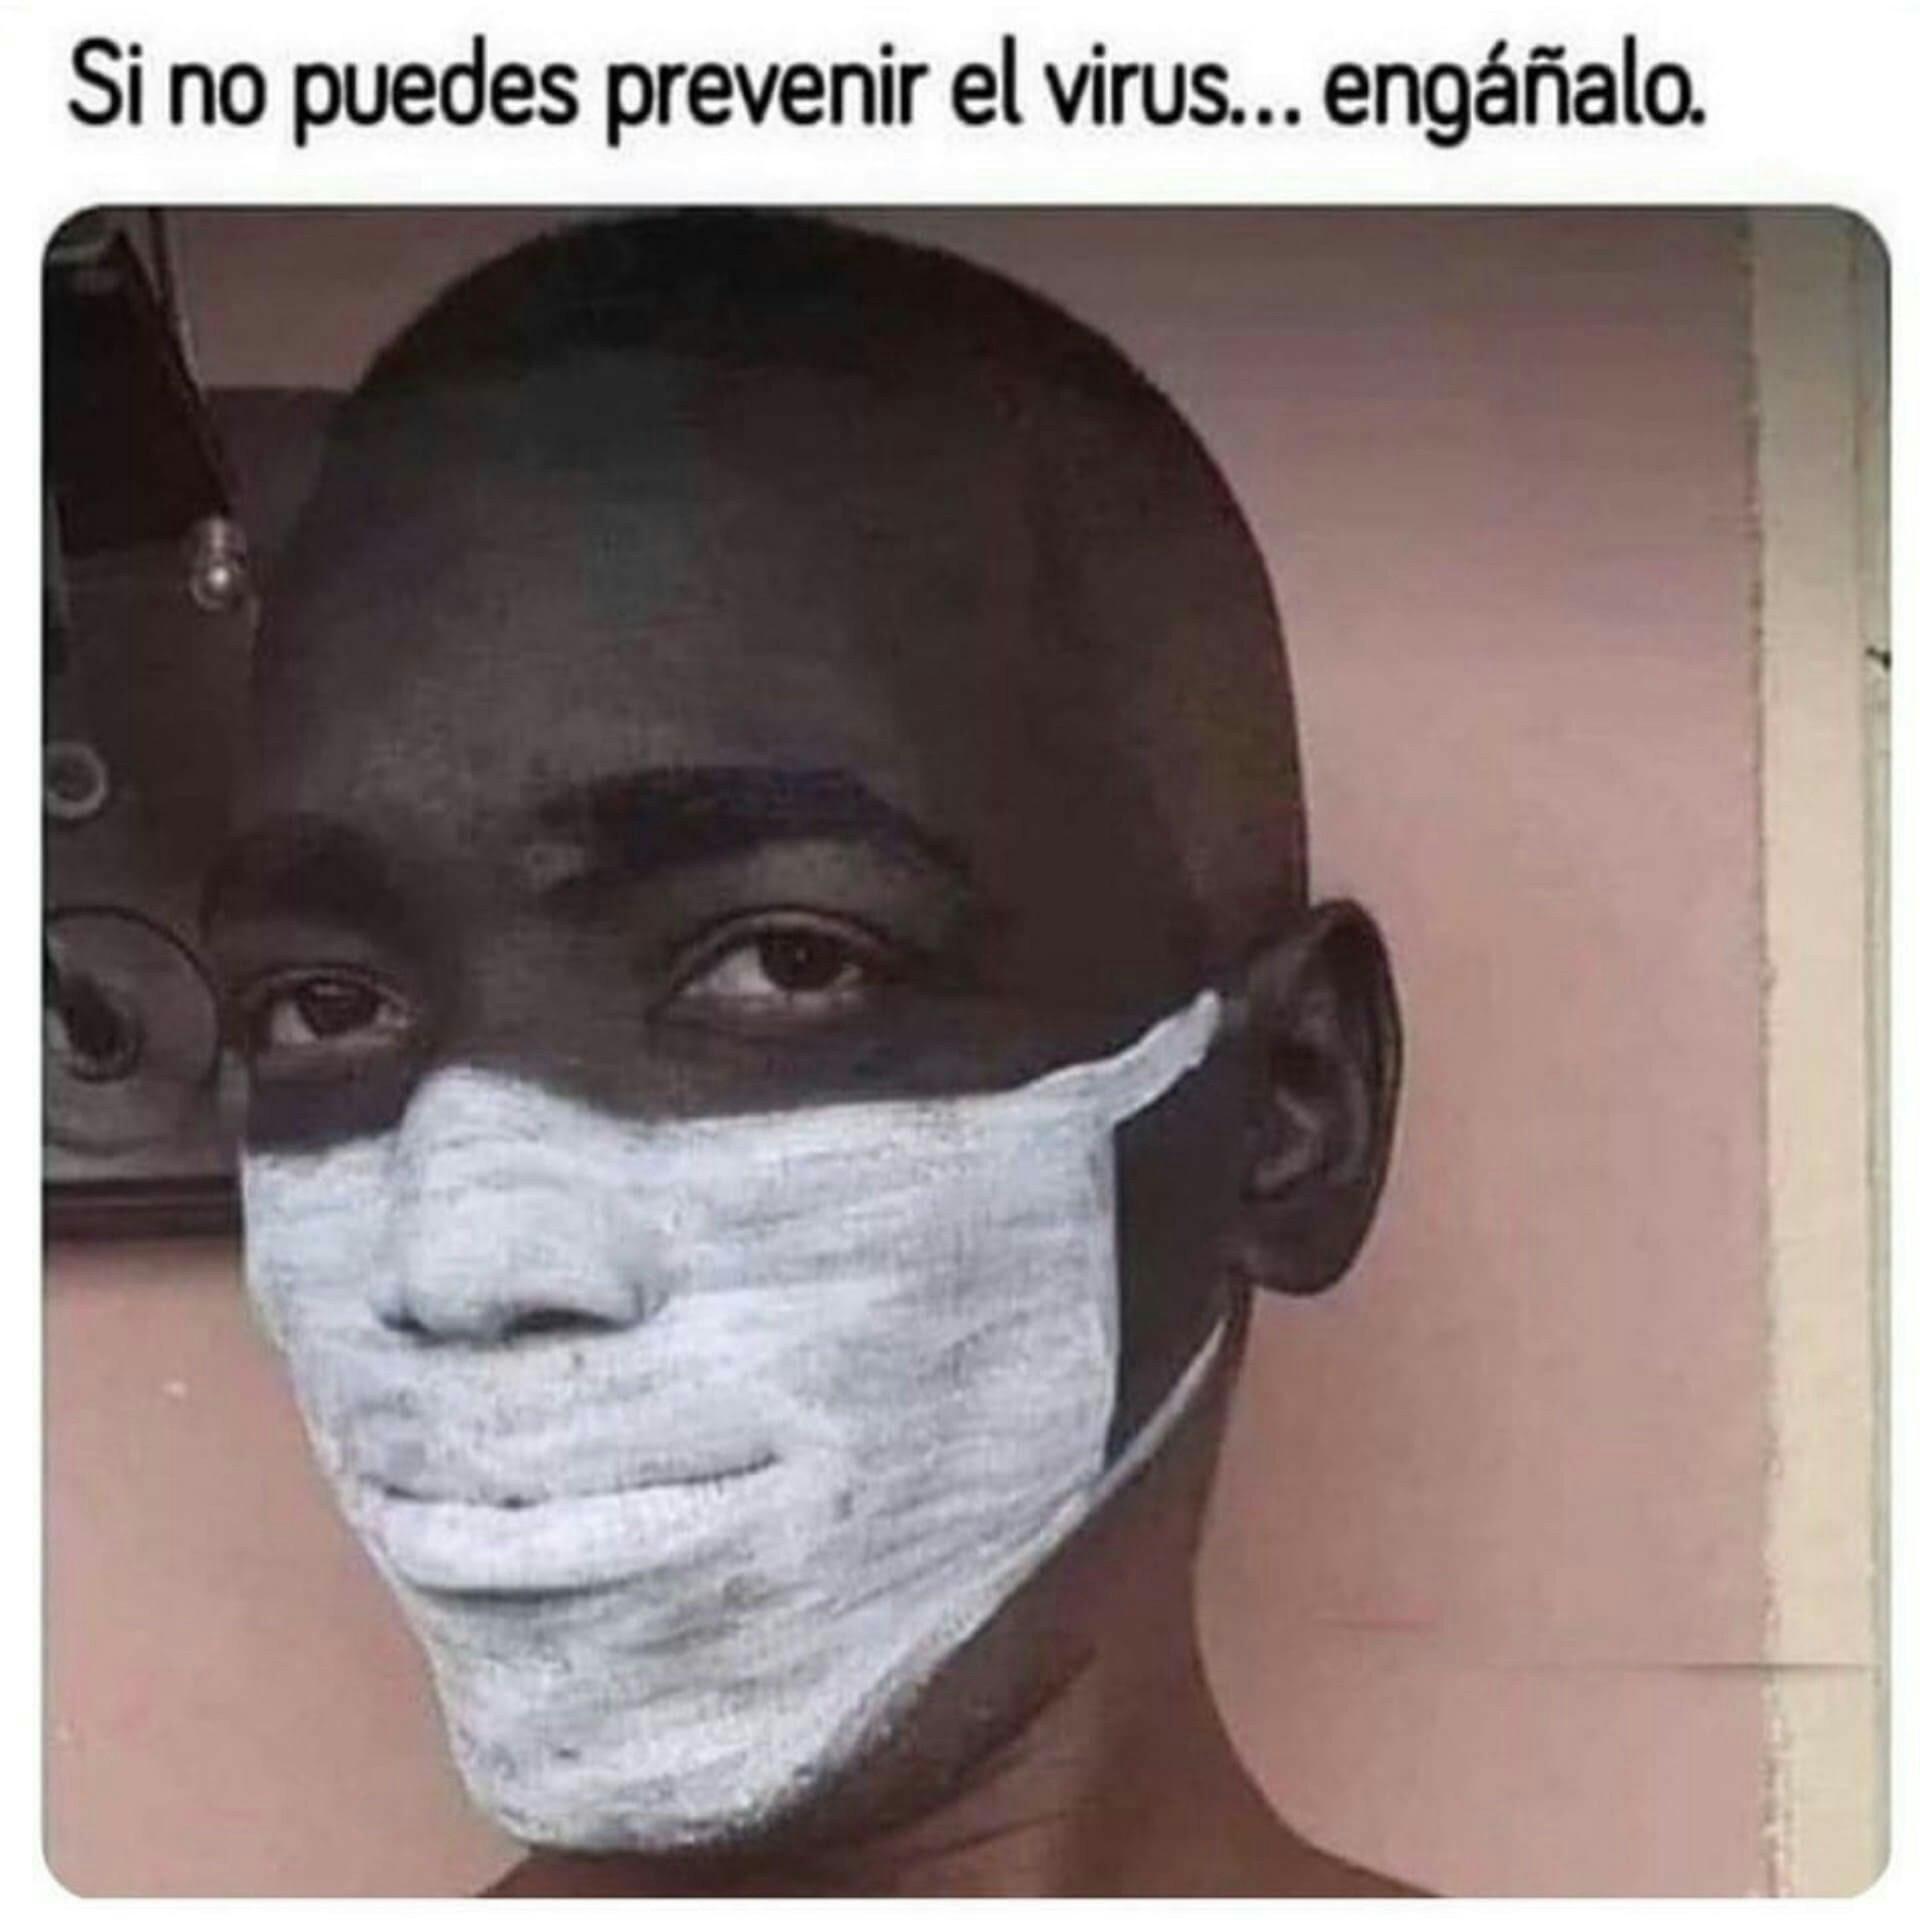 Engaña al virus - meme